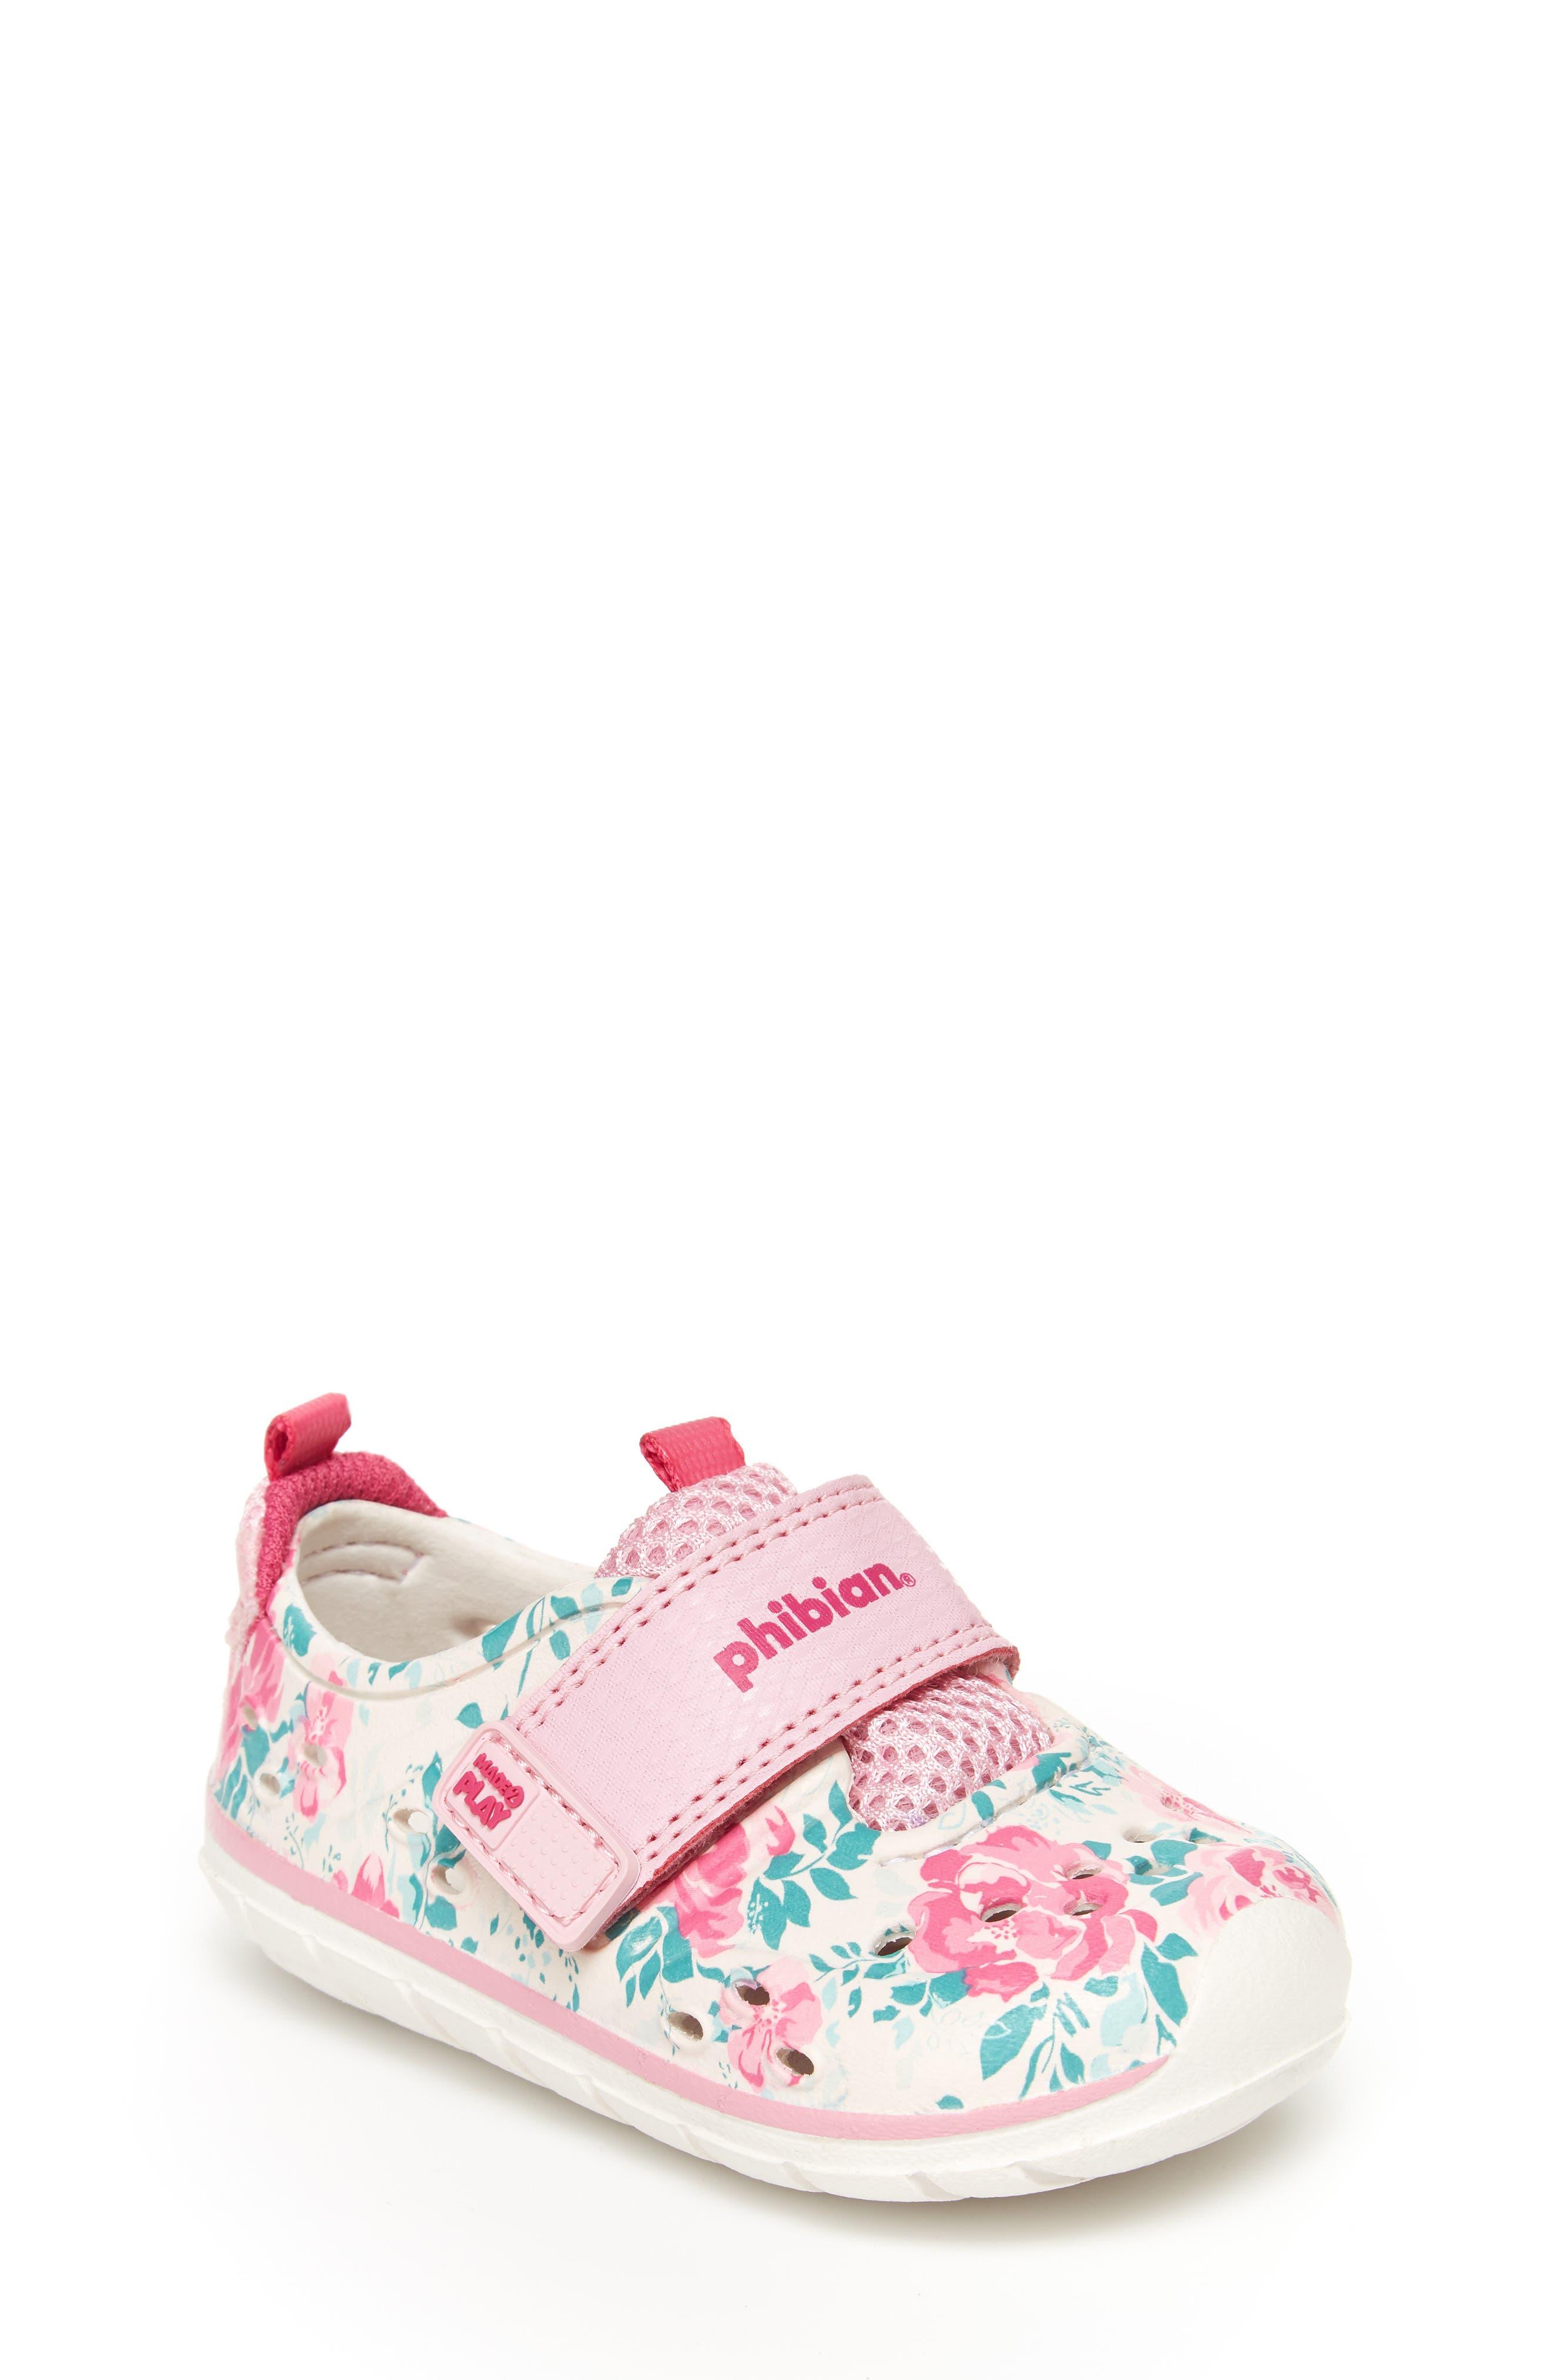 STRIDE RITE, Made2Play<sup>®</sup> Phibian Sneaker, Main thumbnail 1, color, WHITE/ PINK EVA